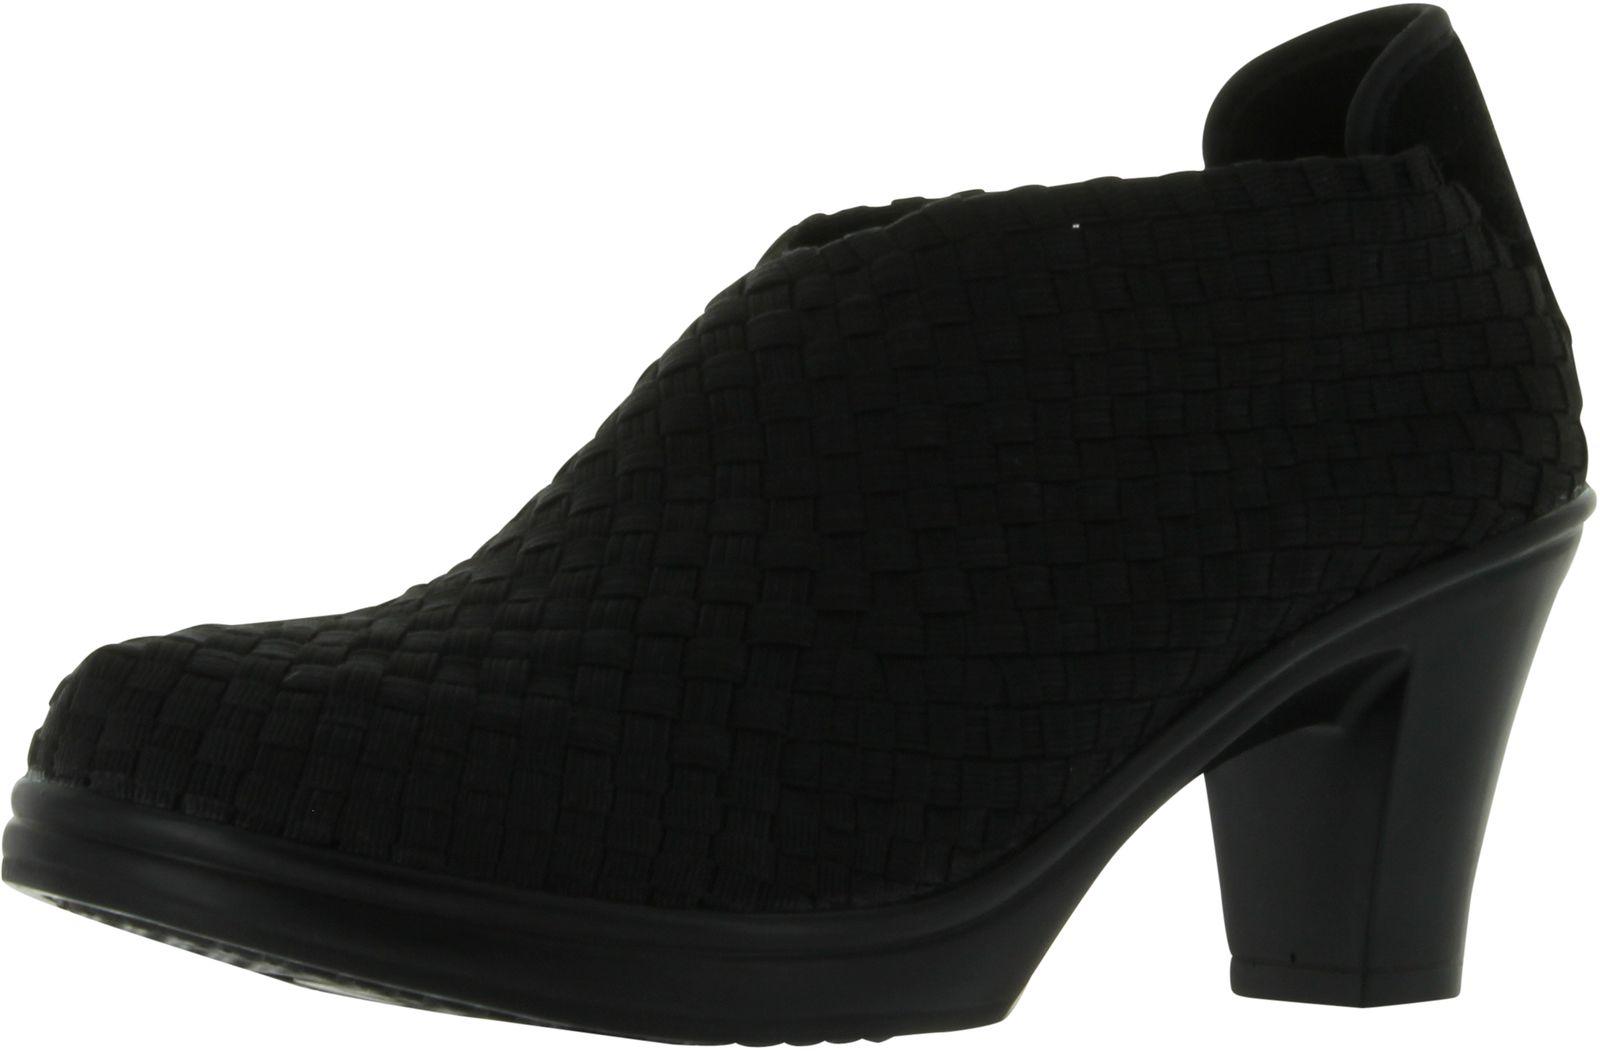 Bernie Mev Womens Shoes